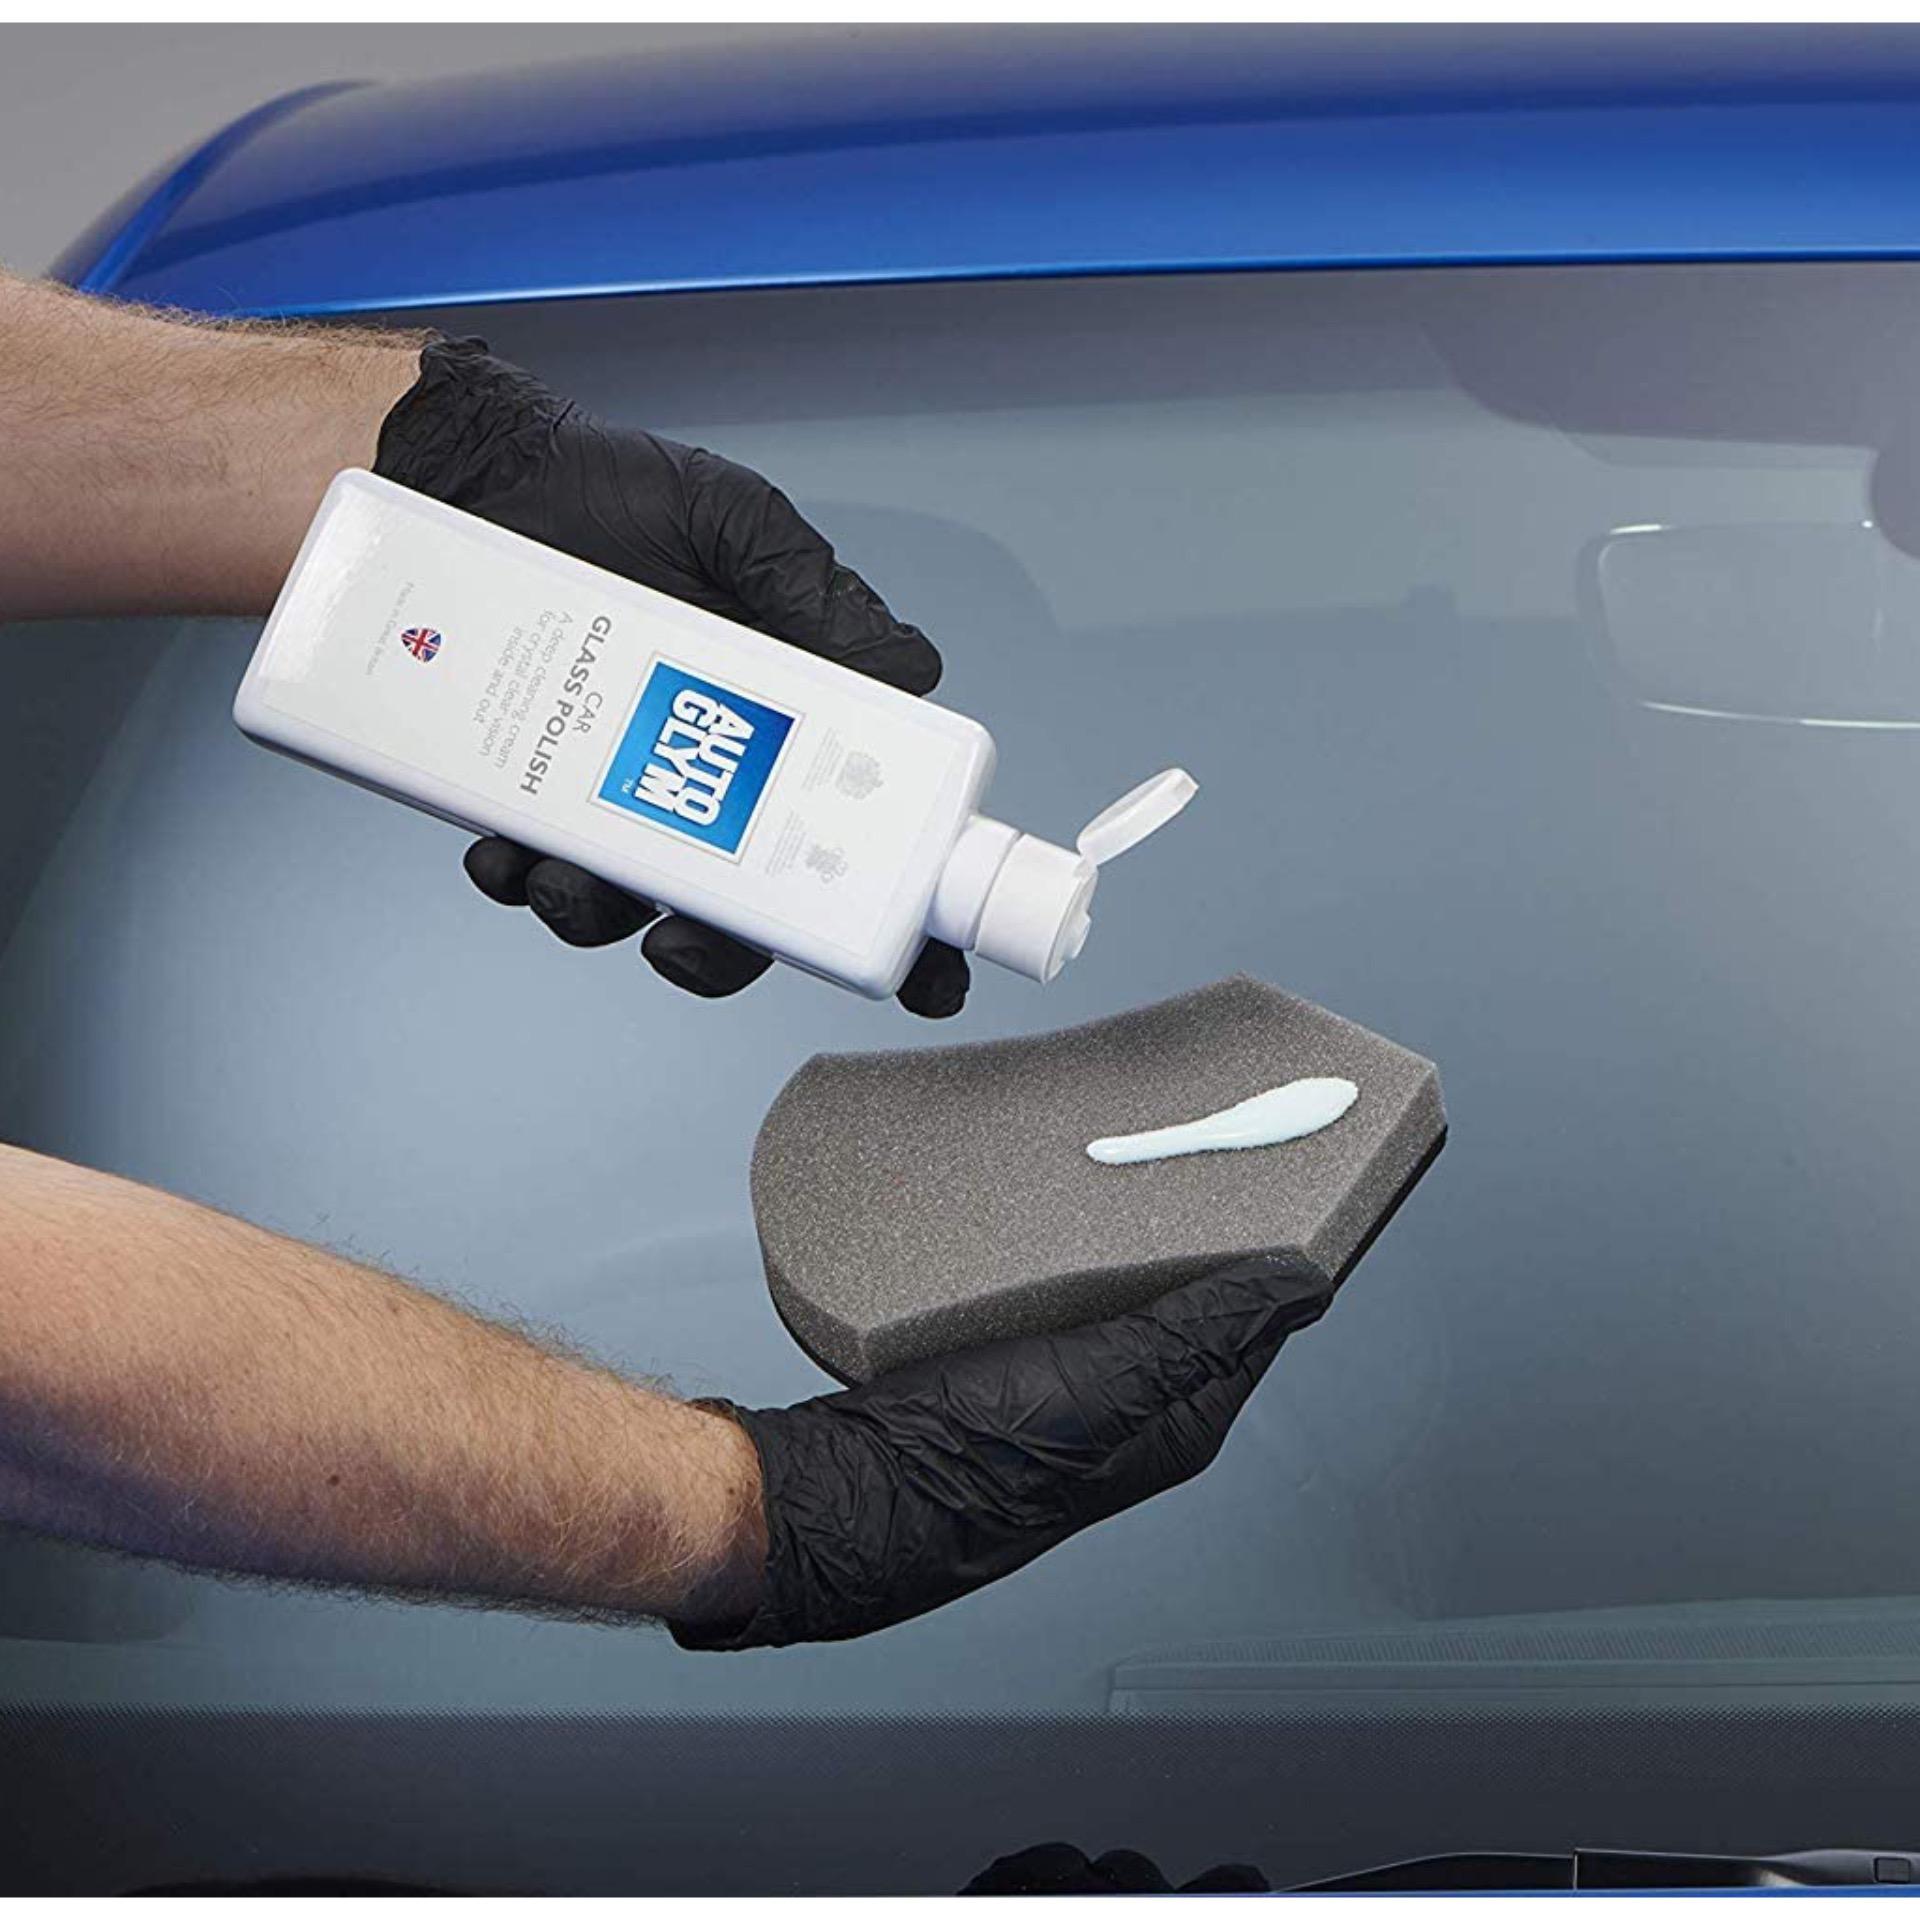 Autoglym Car Glass Polish 325ml | Deep Cleaning Cream For Crystal Clear Vision.